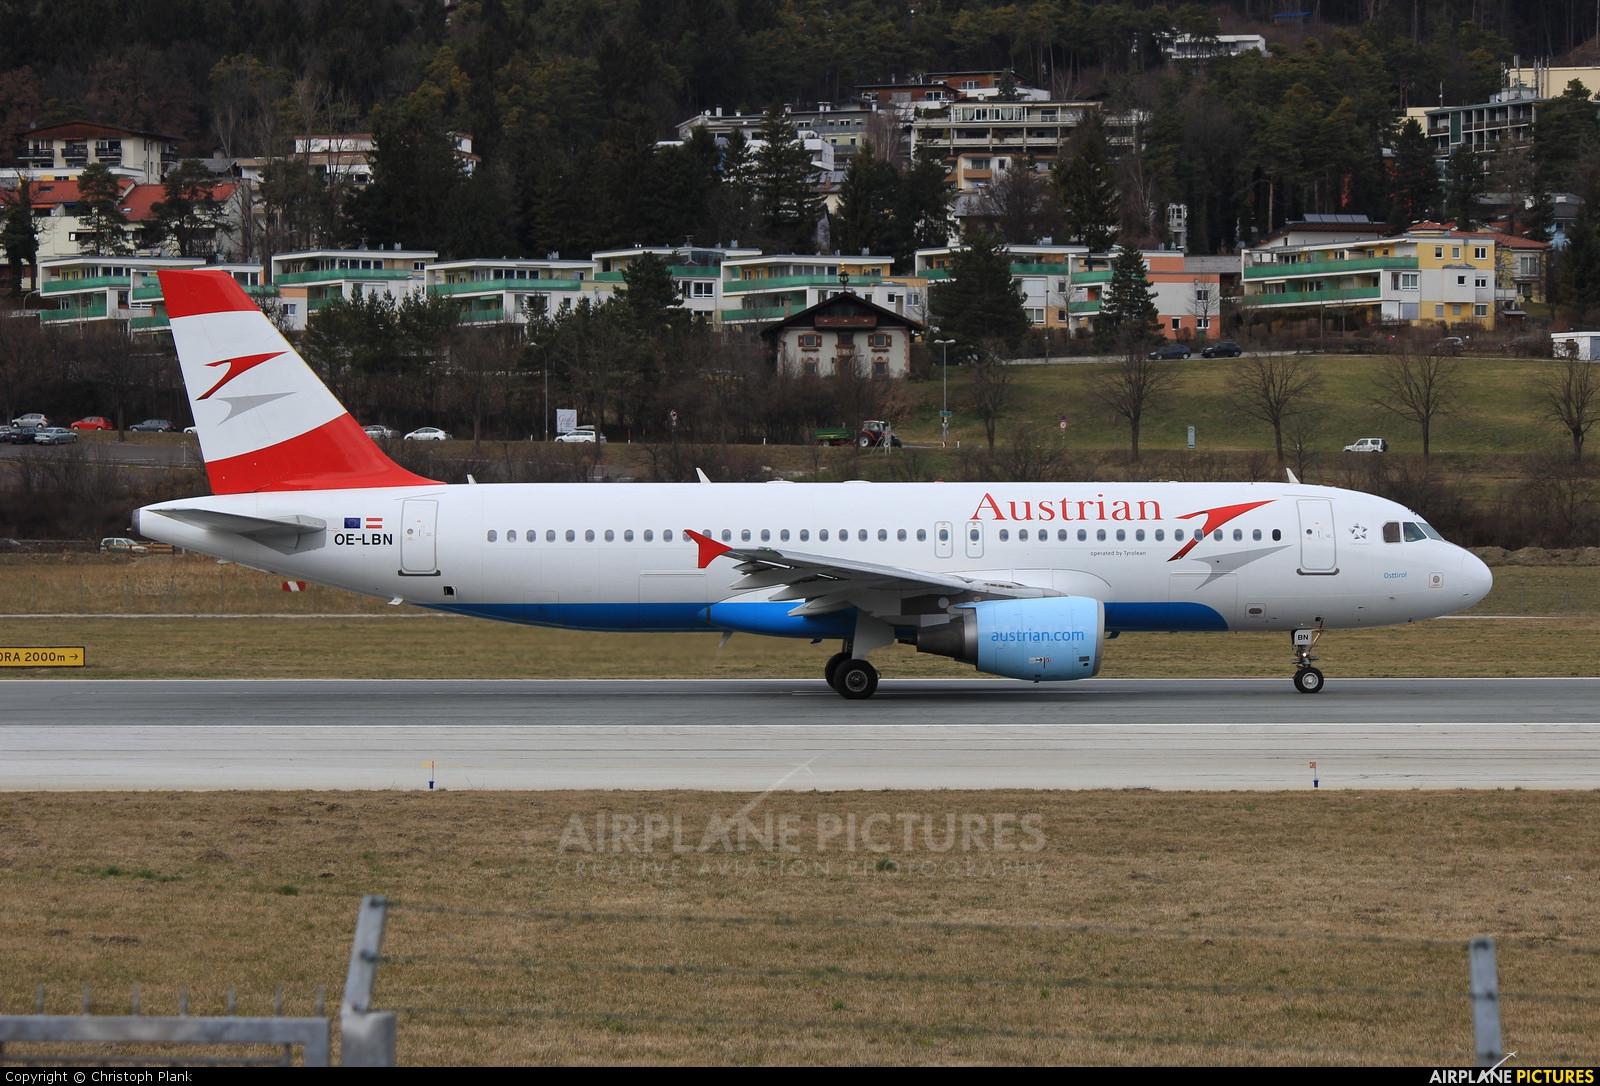 Austrian Airlines/Arrows/Tyrolean OE-LBN aircraft at Innsbruck